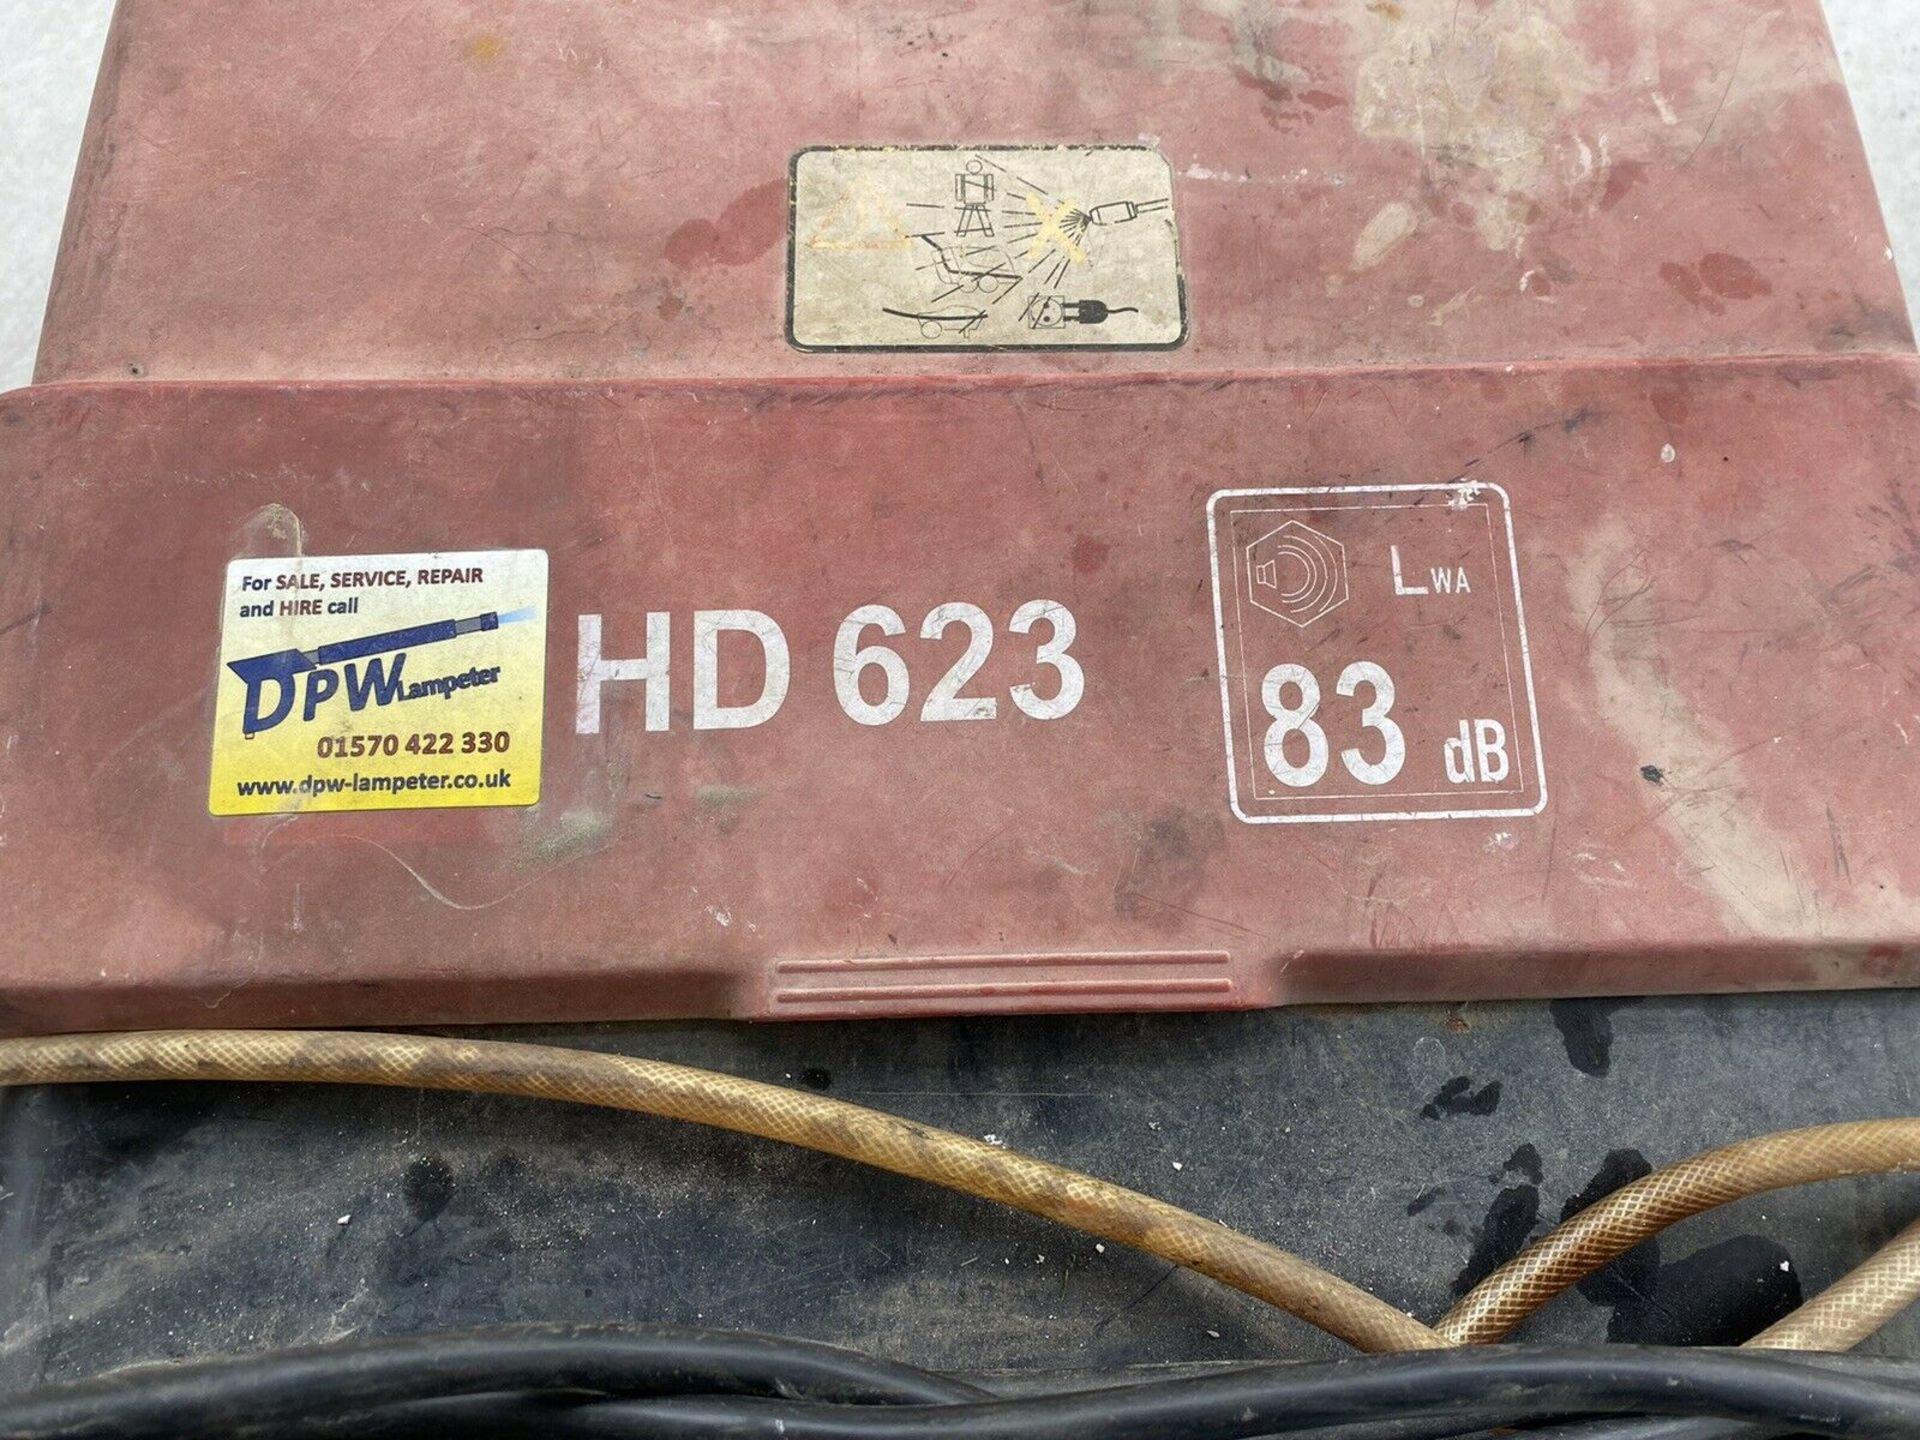 EHRLE HD623 STANDARD HOT WATER PRESSURE WASHER *NO VAT* - Image 5 of 6